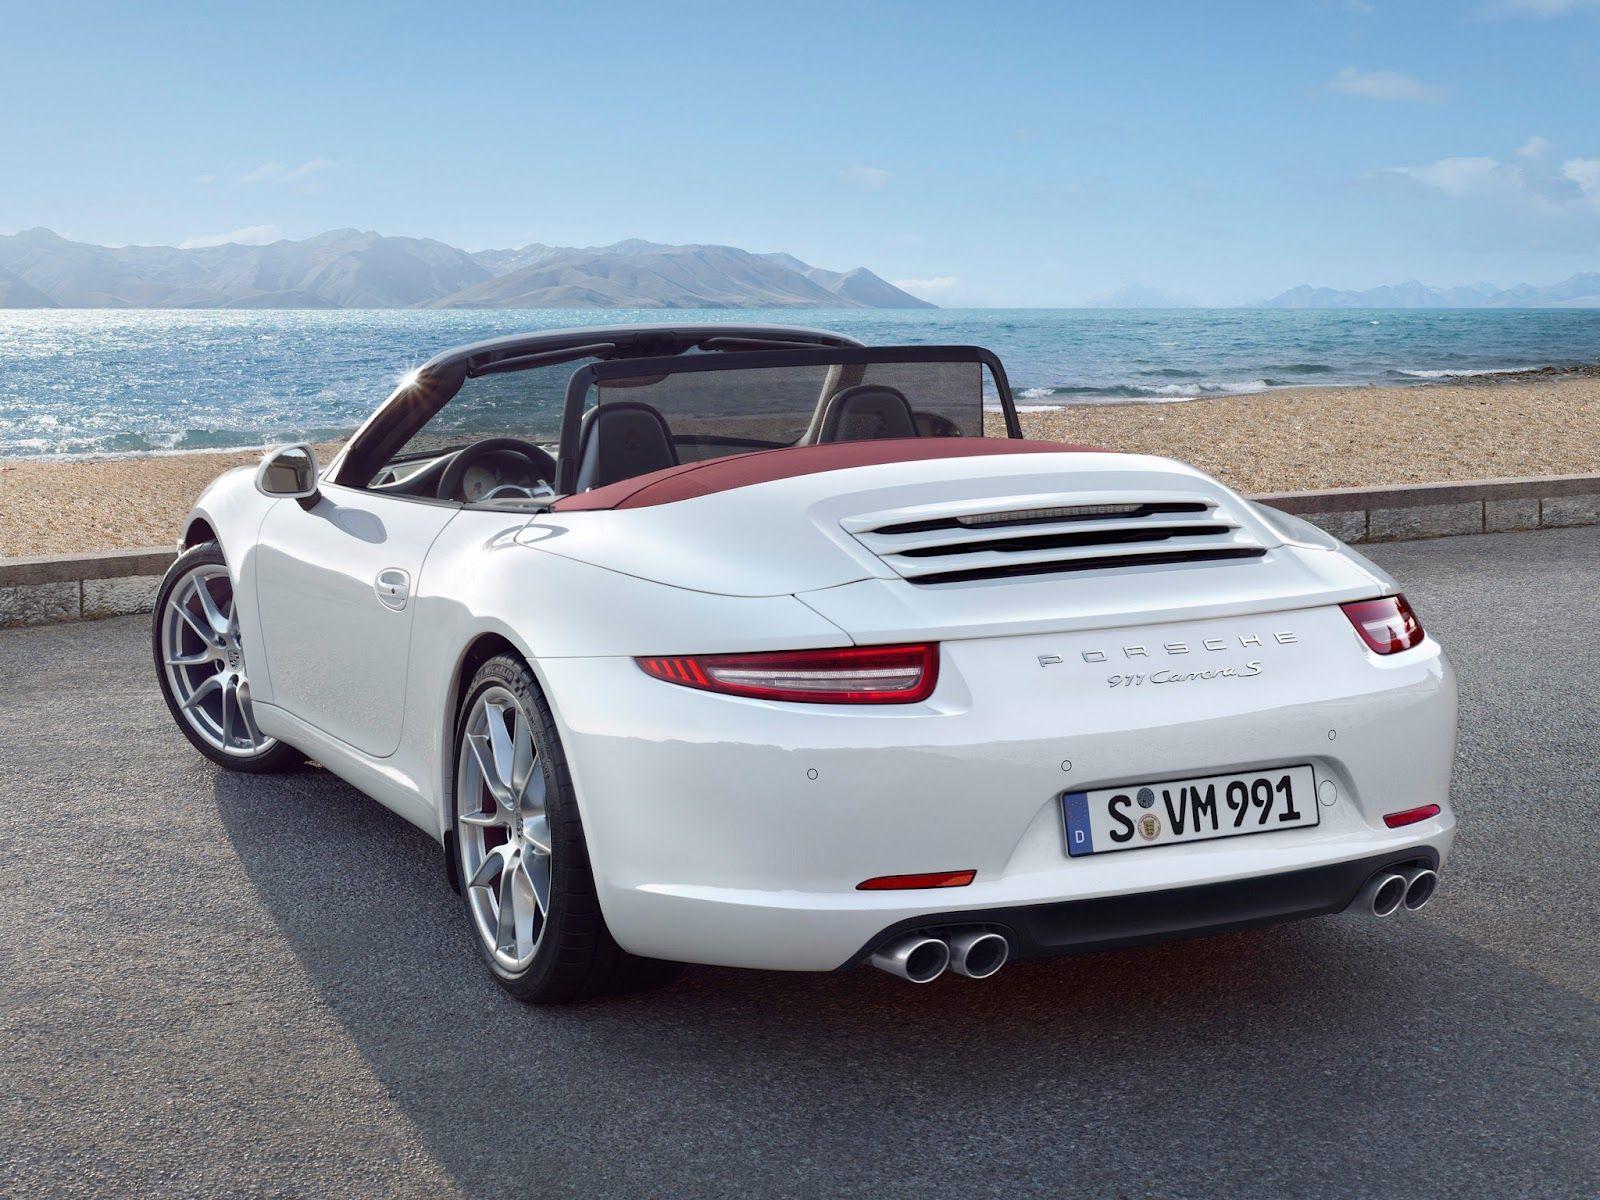 2016 porsche 911 carrera 4 gts cabriolet classy cars pinterest porsche 911 carrera 4s. Black Bedroom Furniture Sets. Home Design Ideas